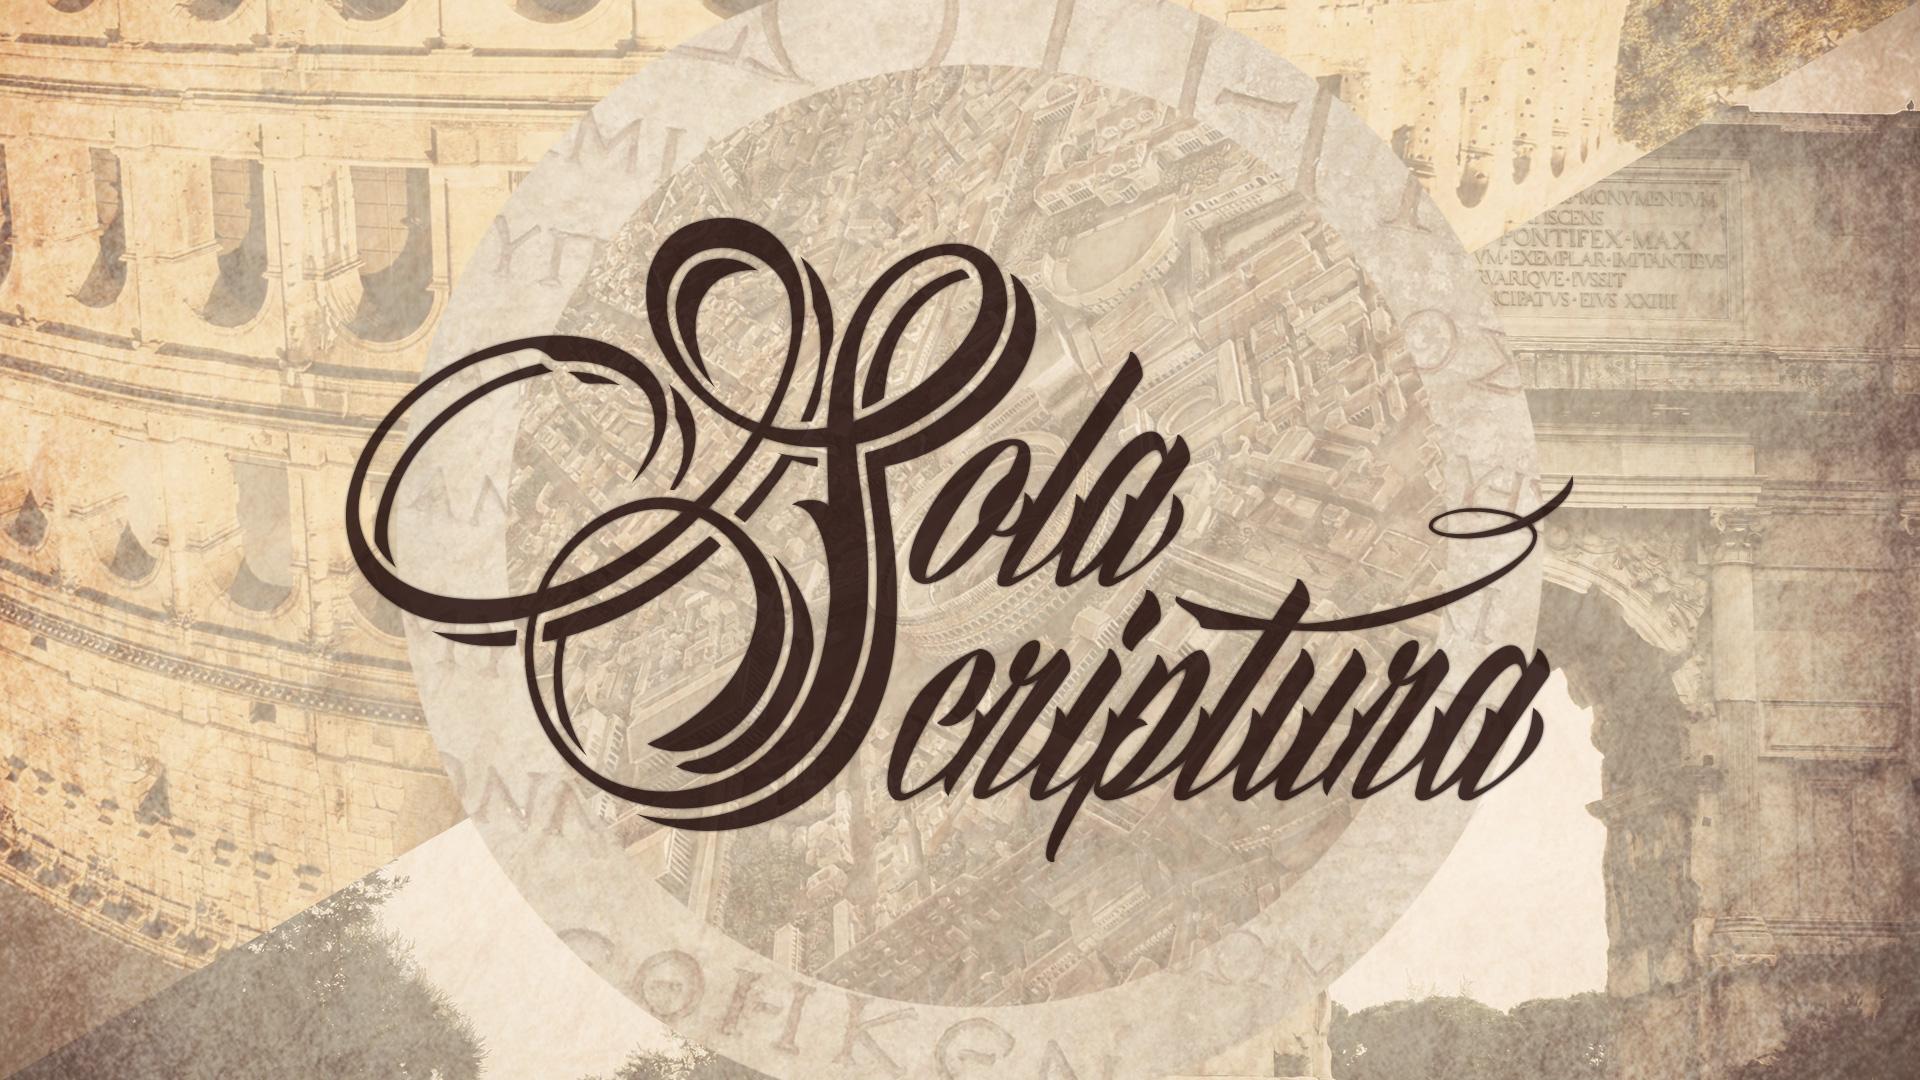 5solas_scriptura-3.jpg